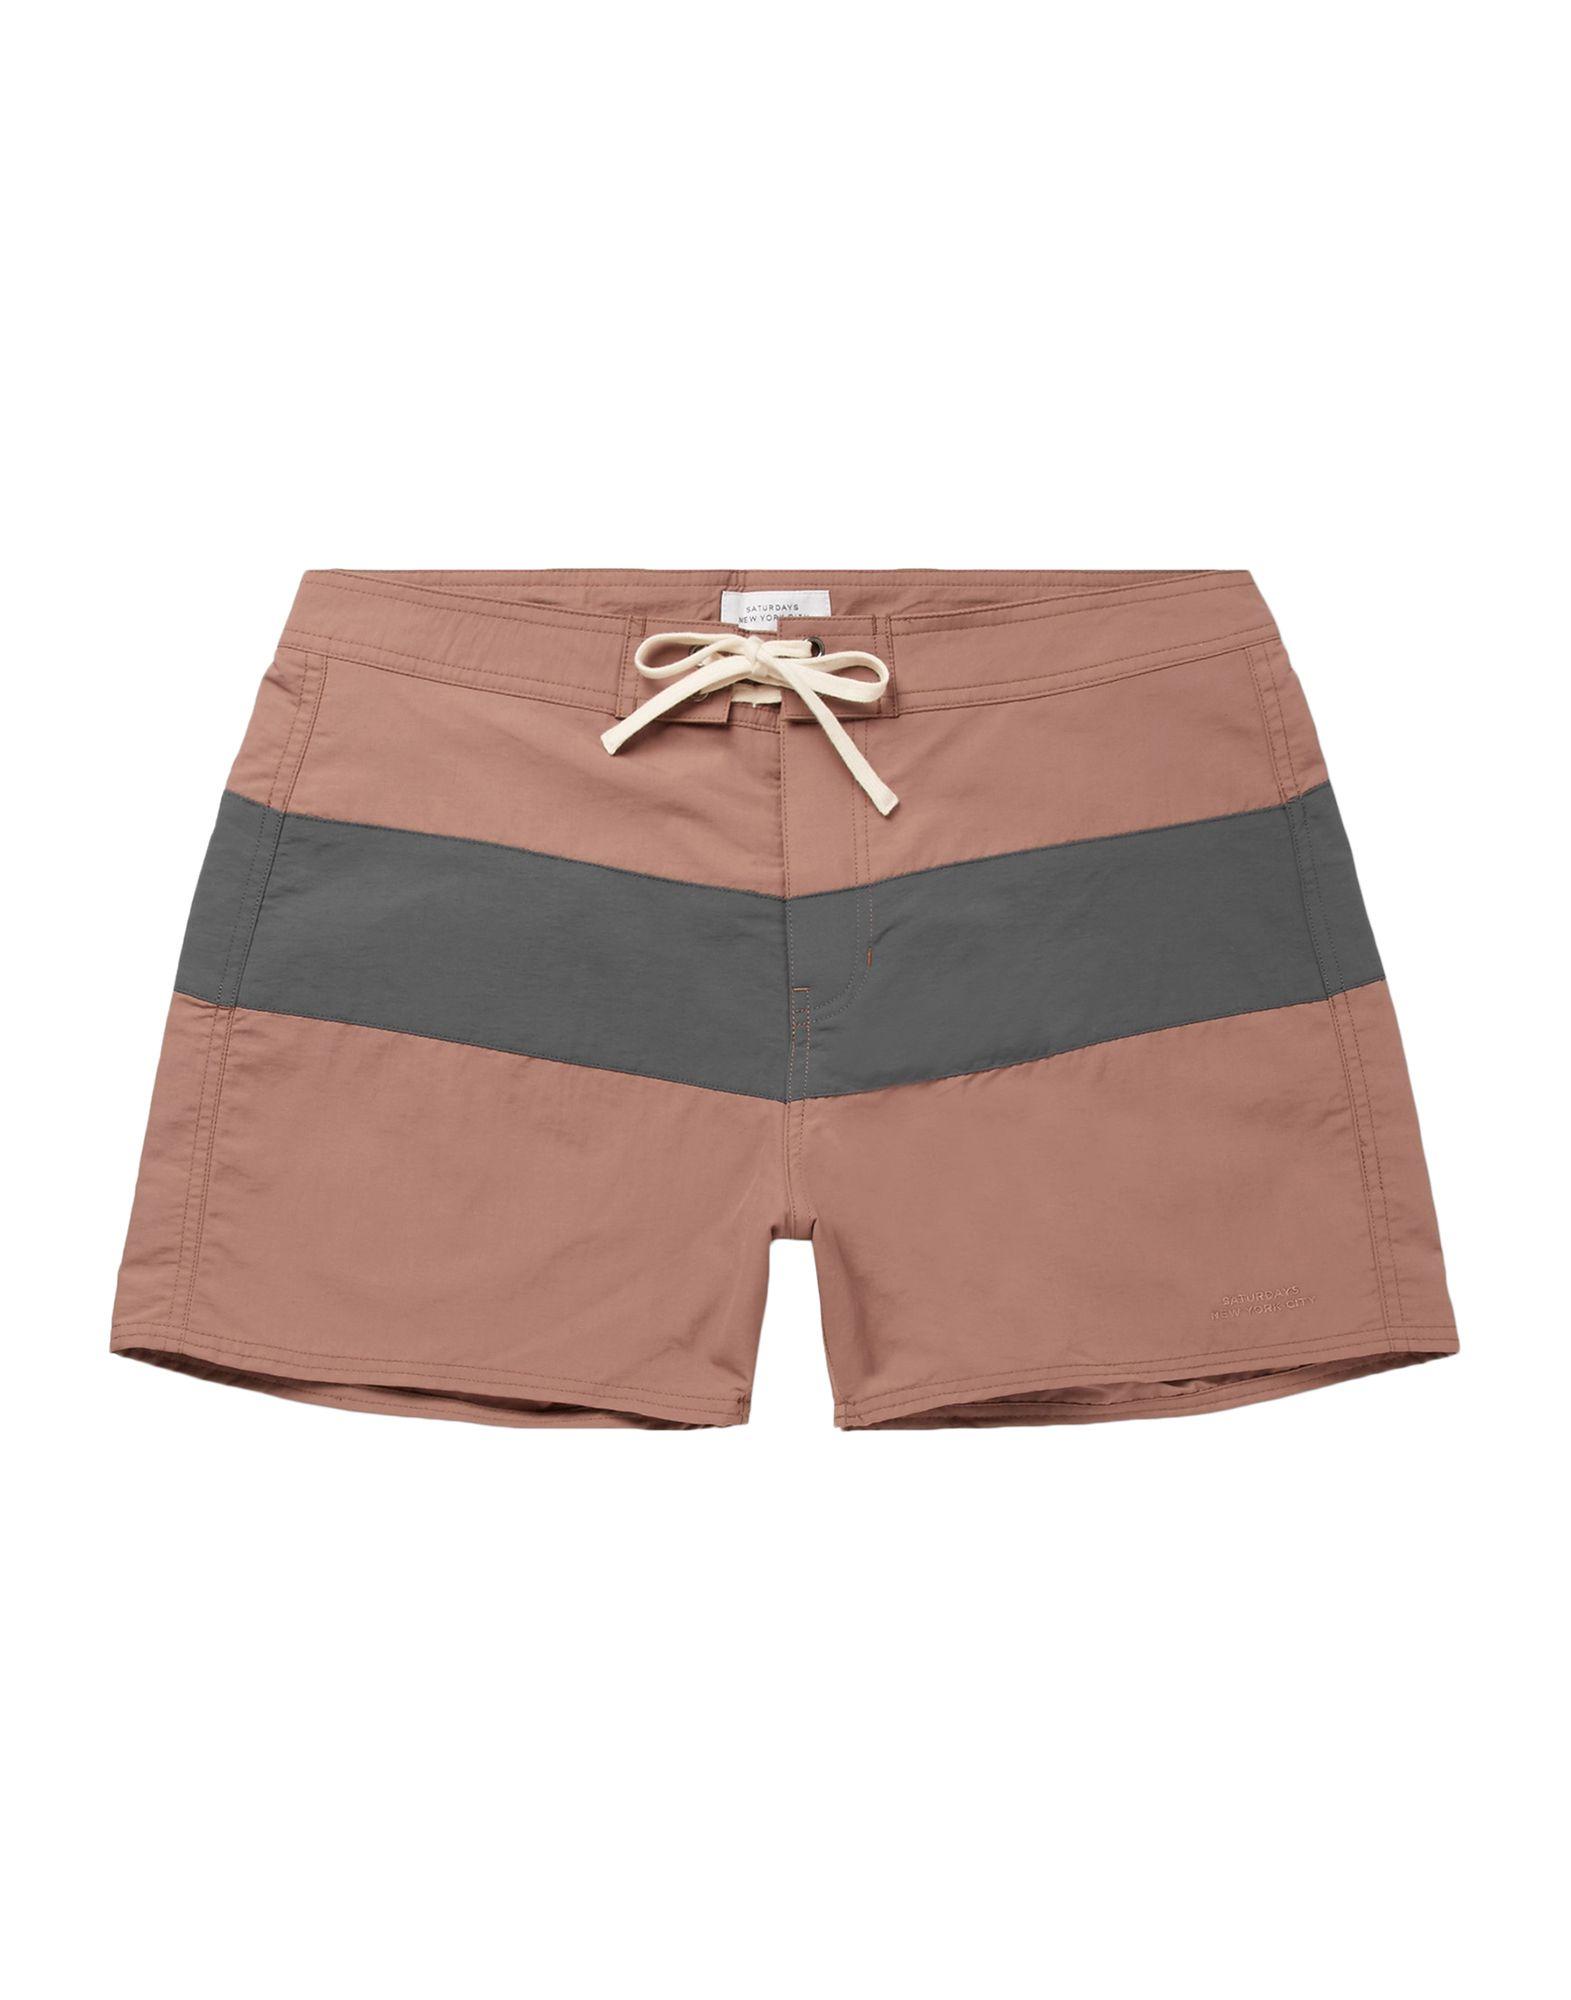 SATURDAYS NEW YORK CITY Пляжные брюки и шорты цены онлайн